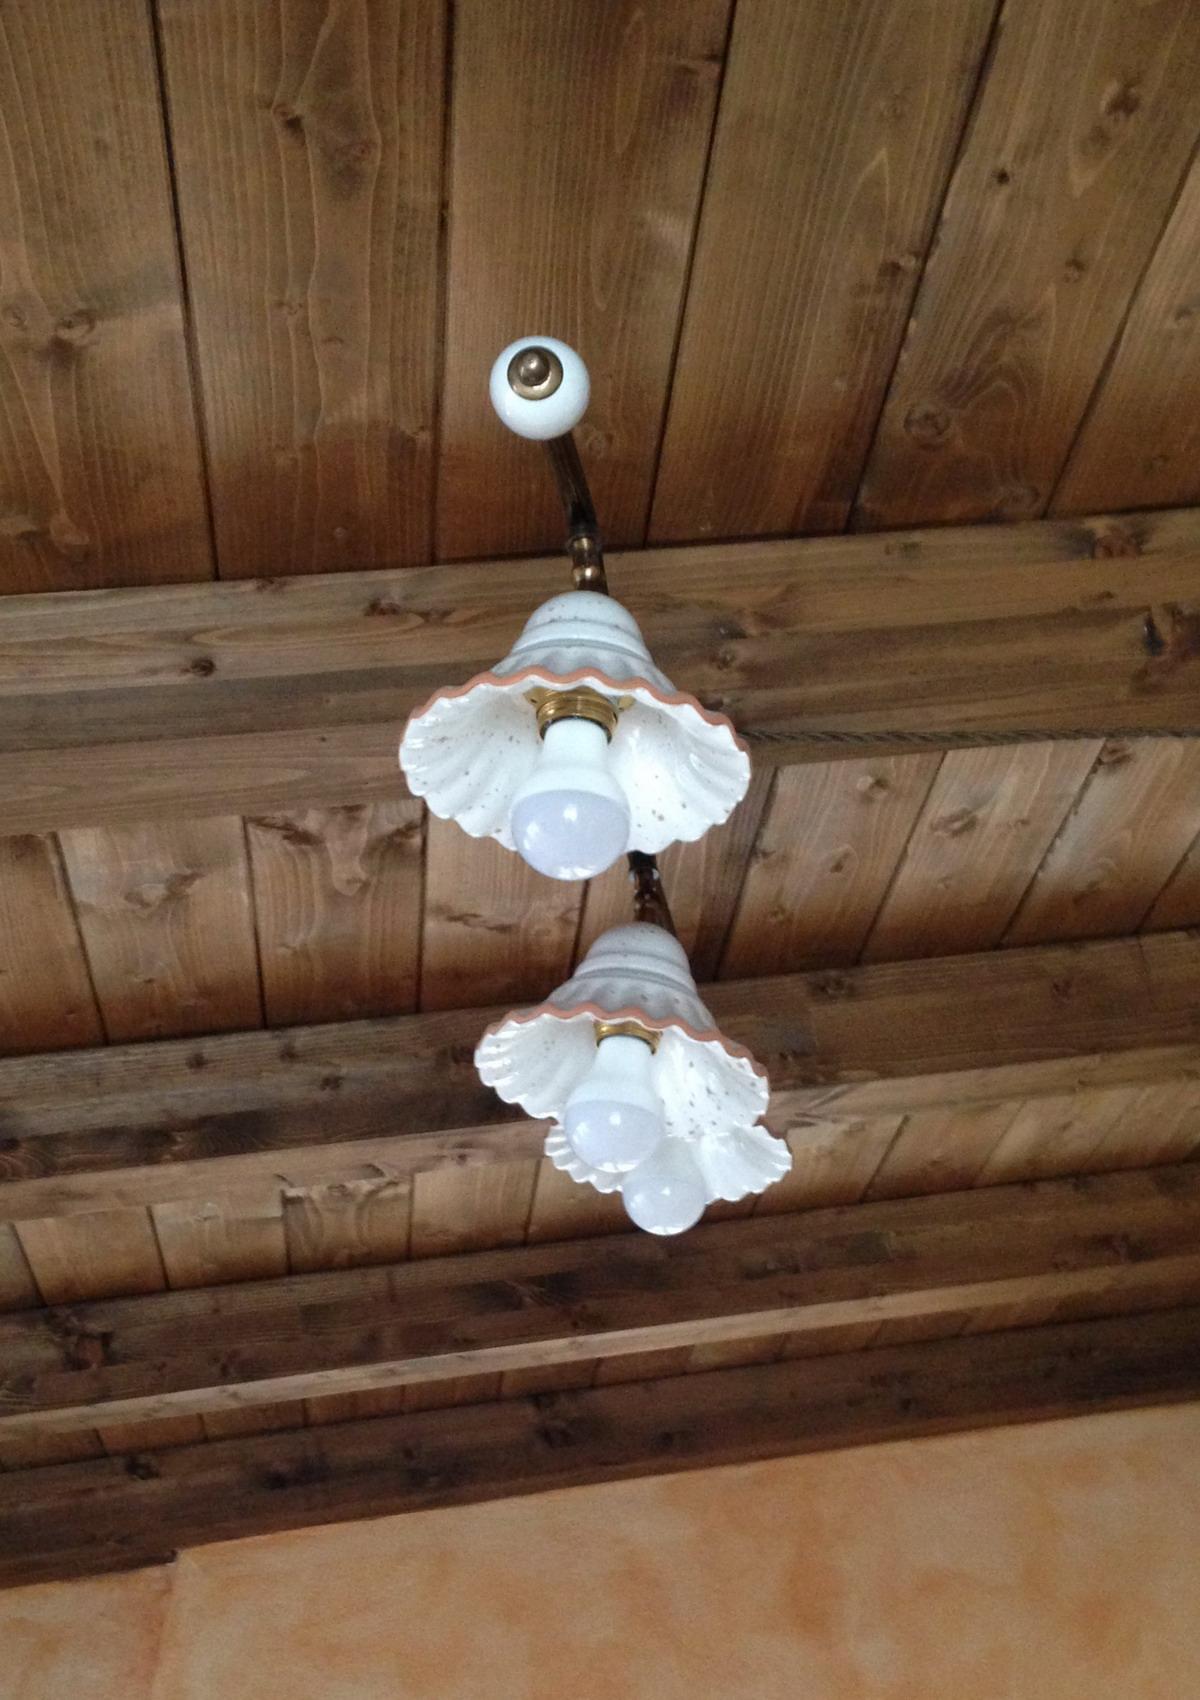 Taverna, illuminazione lampadari e applique in ceramica.